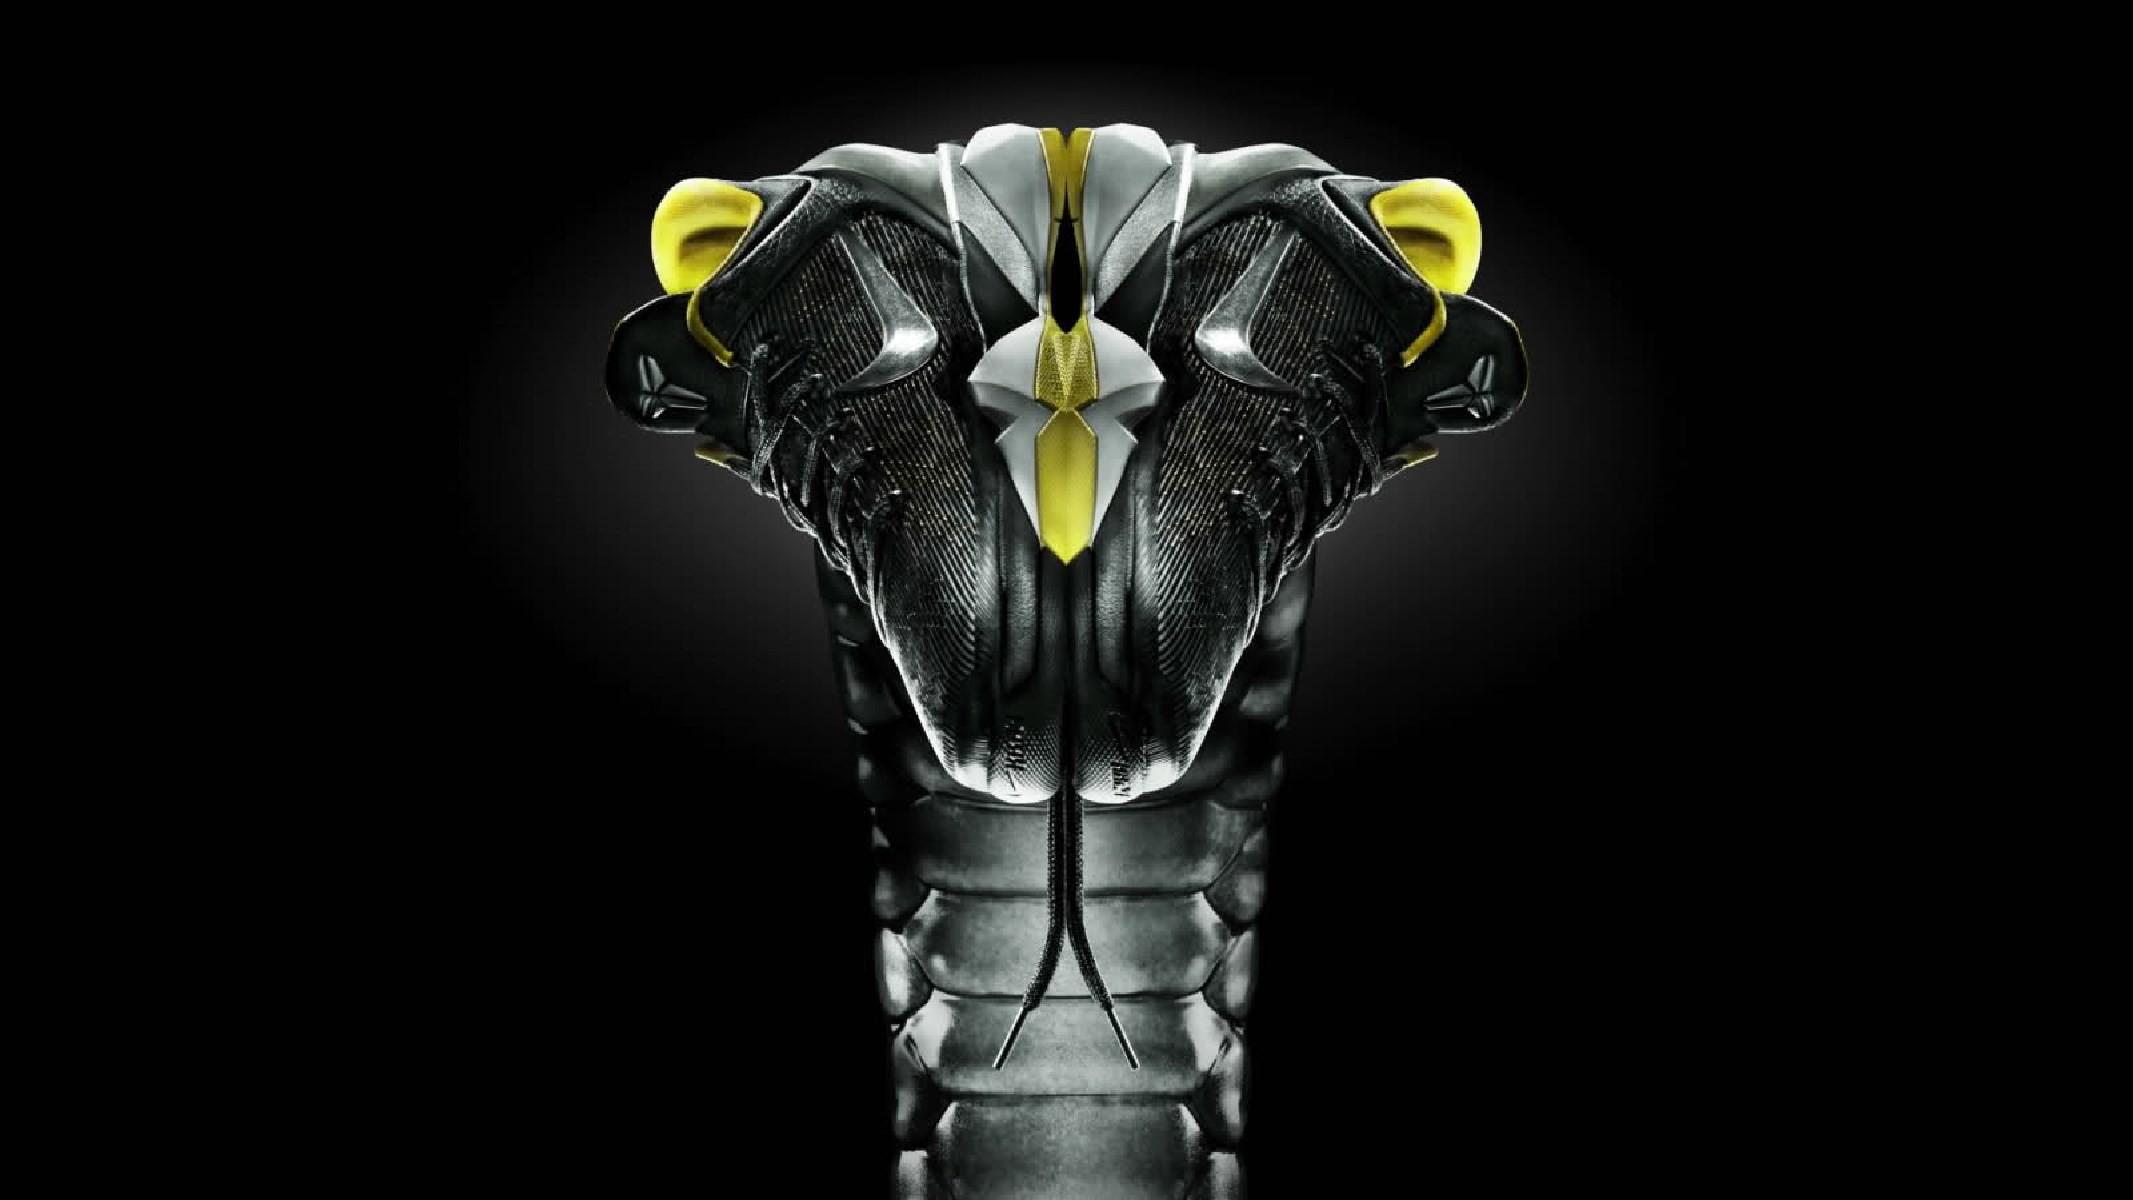 Res: 2133x1200, Kobe Bryant Black Mamba Wallpaper Images